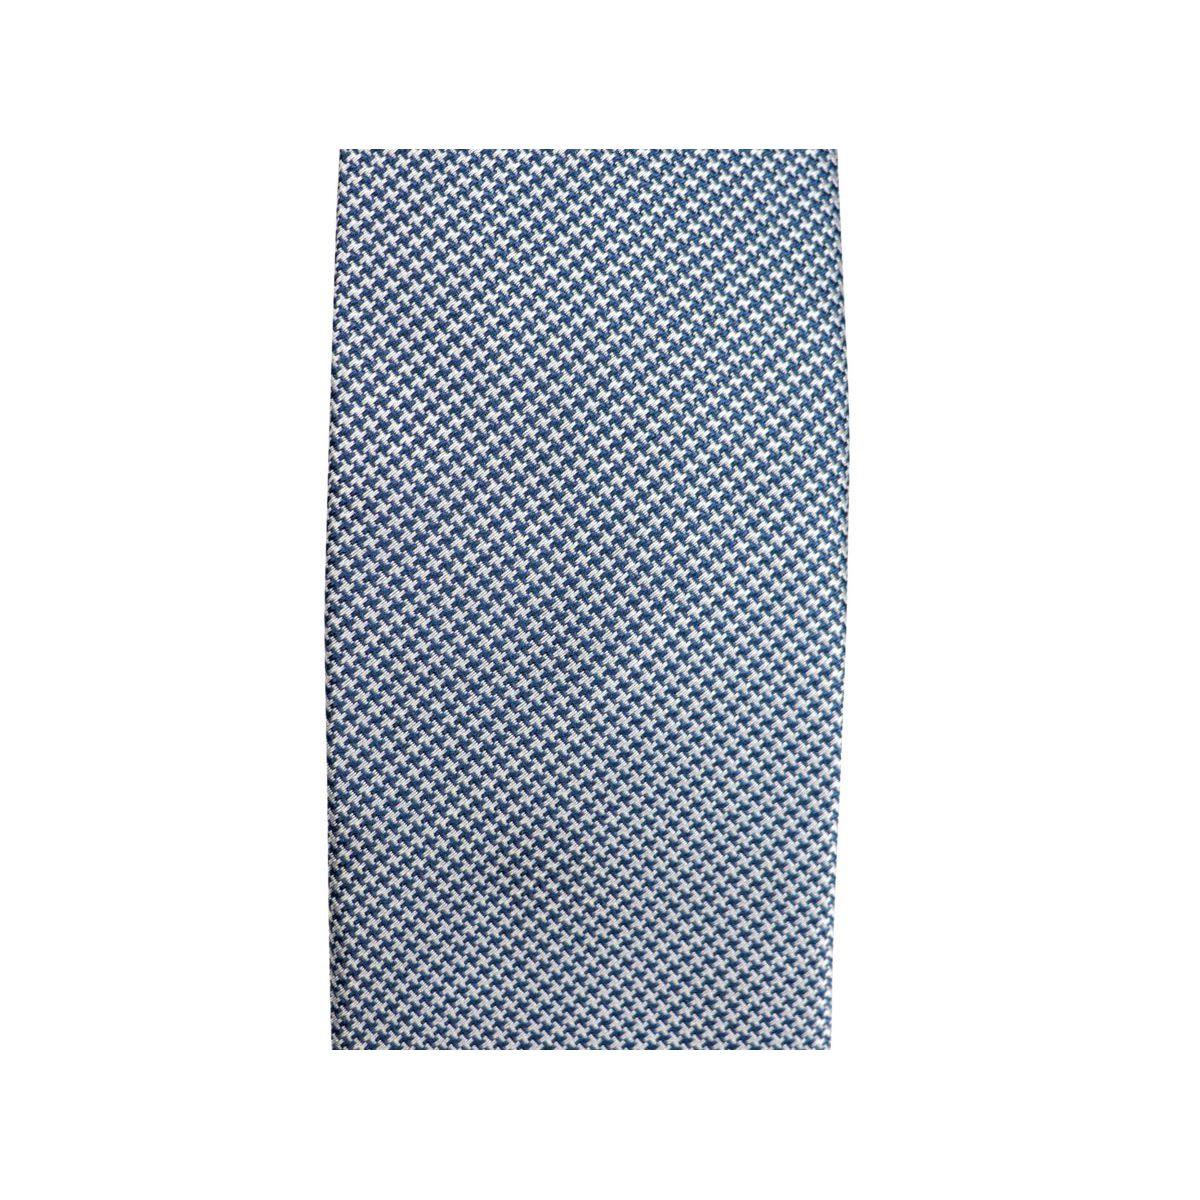 CM 7 bicolor micro patterned silk tie Silver Church's